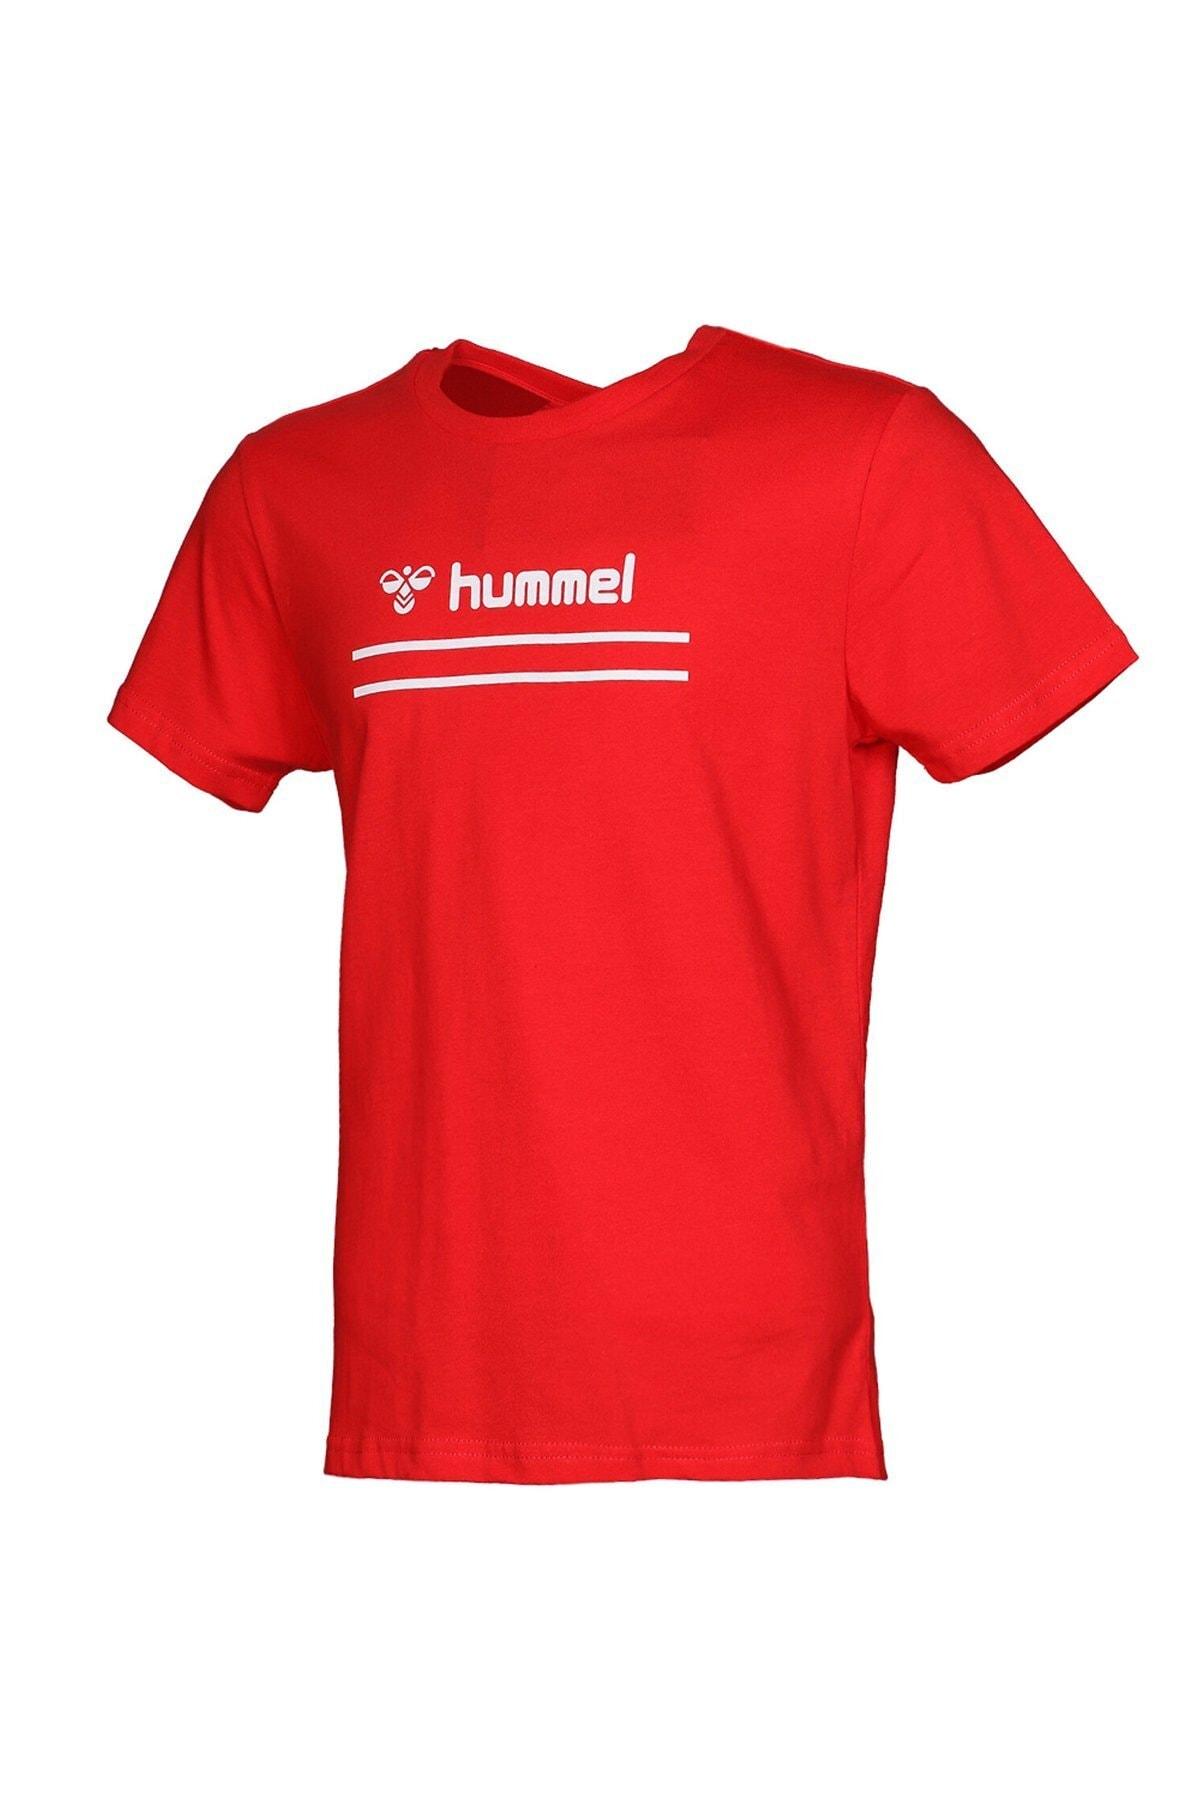 HUMMEL Kız Çocuk Kırmızı Kısa Kollu T-Shirt 1